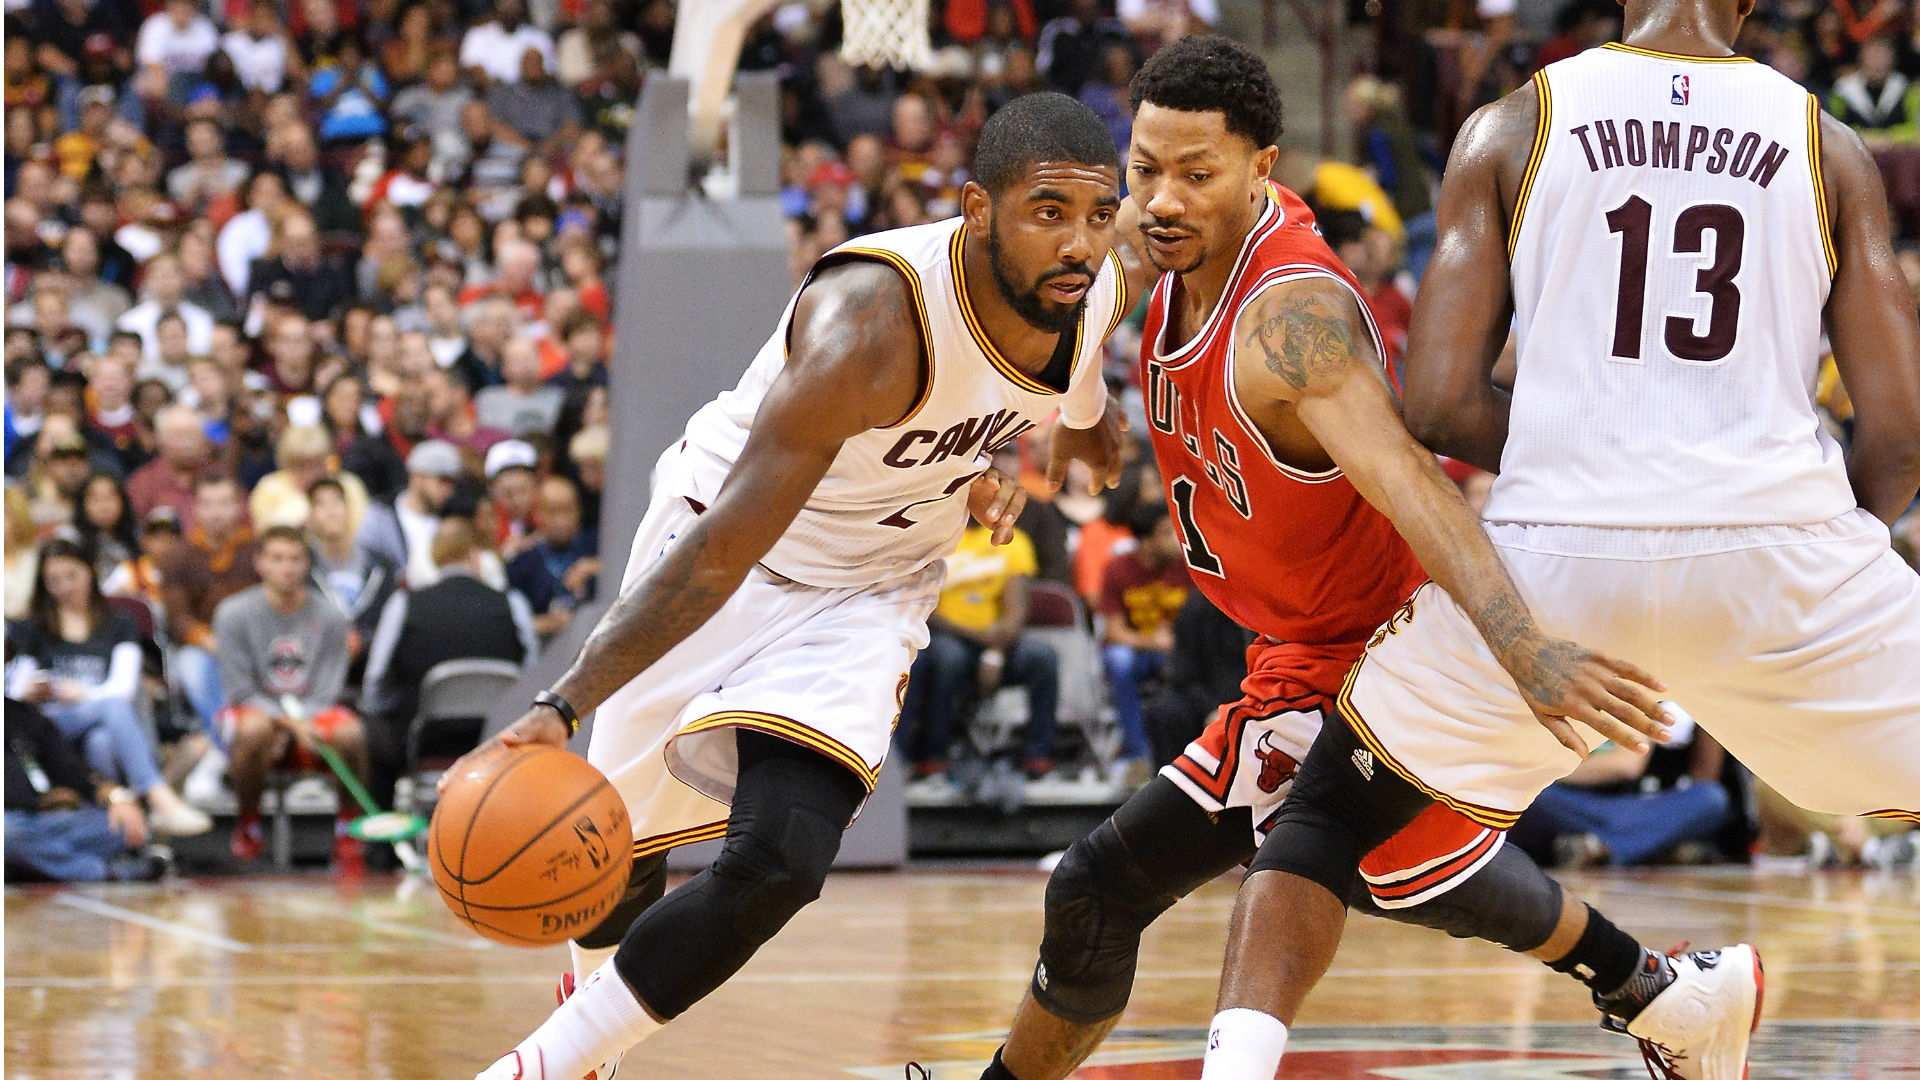 NBA playoffs Round 2: Chicago Bulls vs. Cleveland Cavaliers